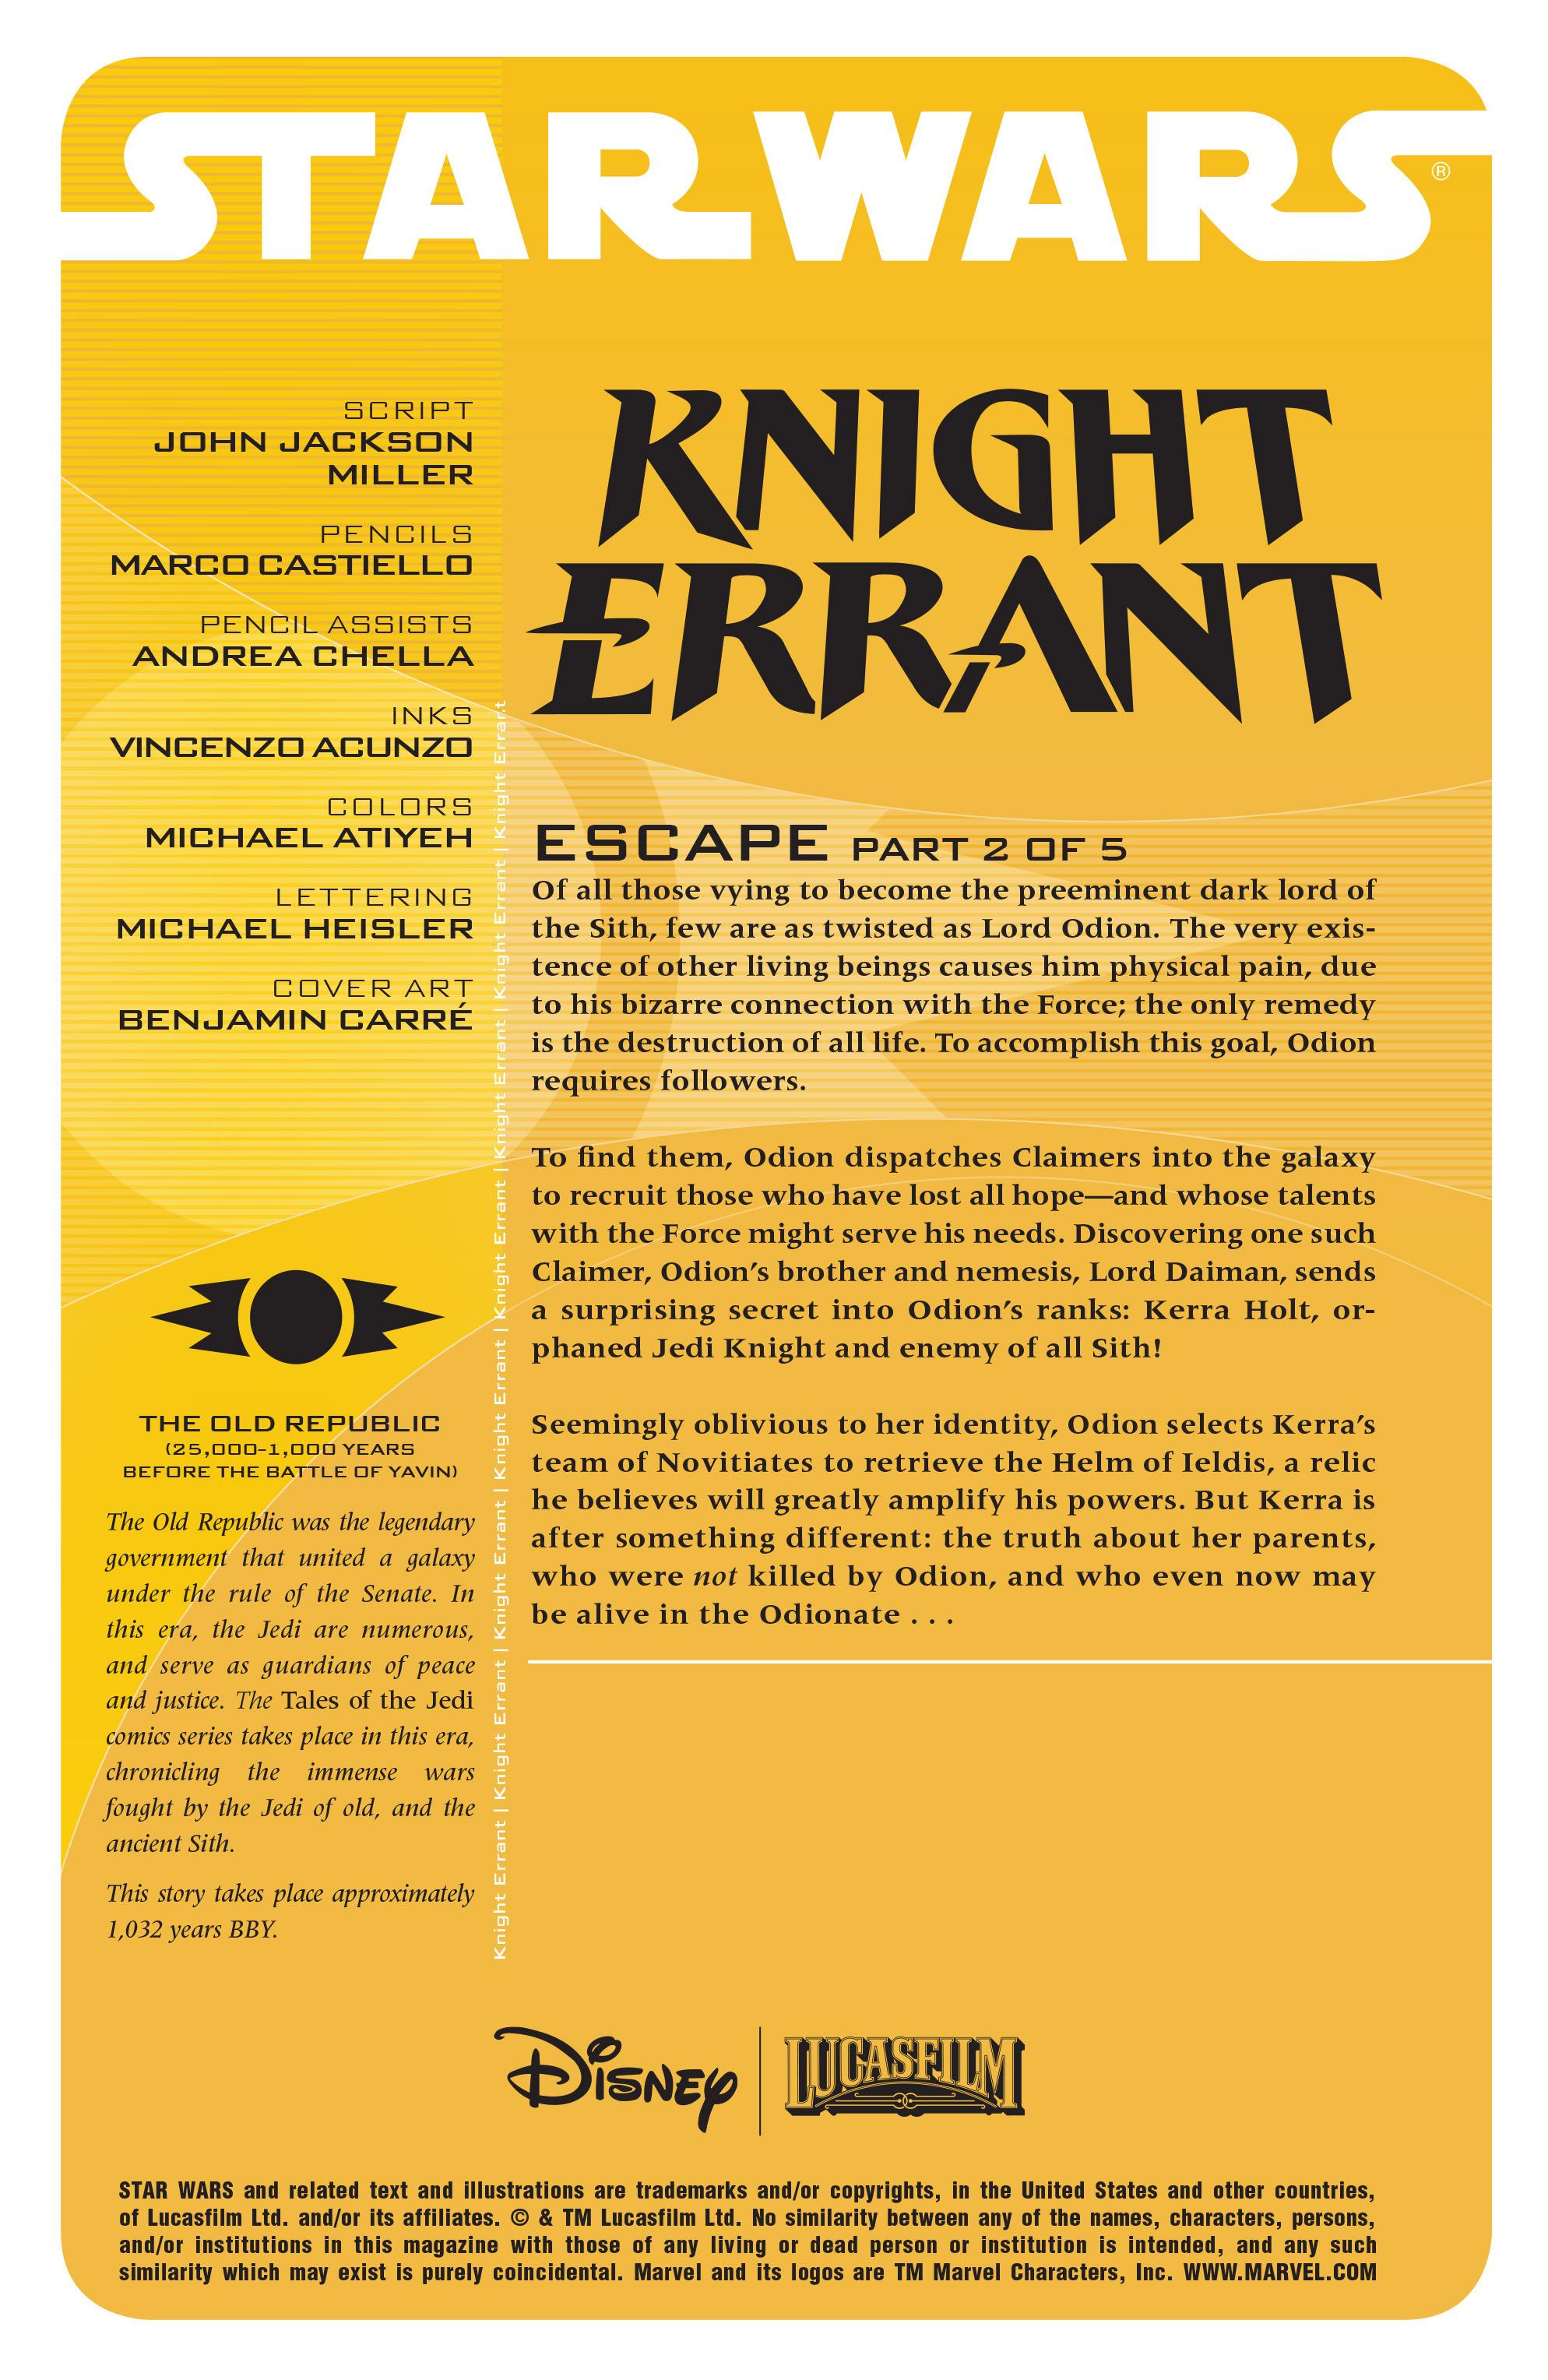 Read online Star Wars: Knight Errant - Escape comic -  Issue #2 - 2